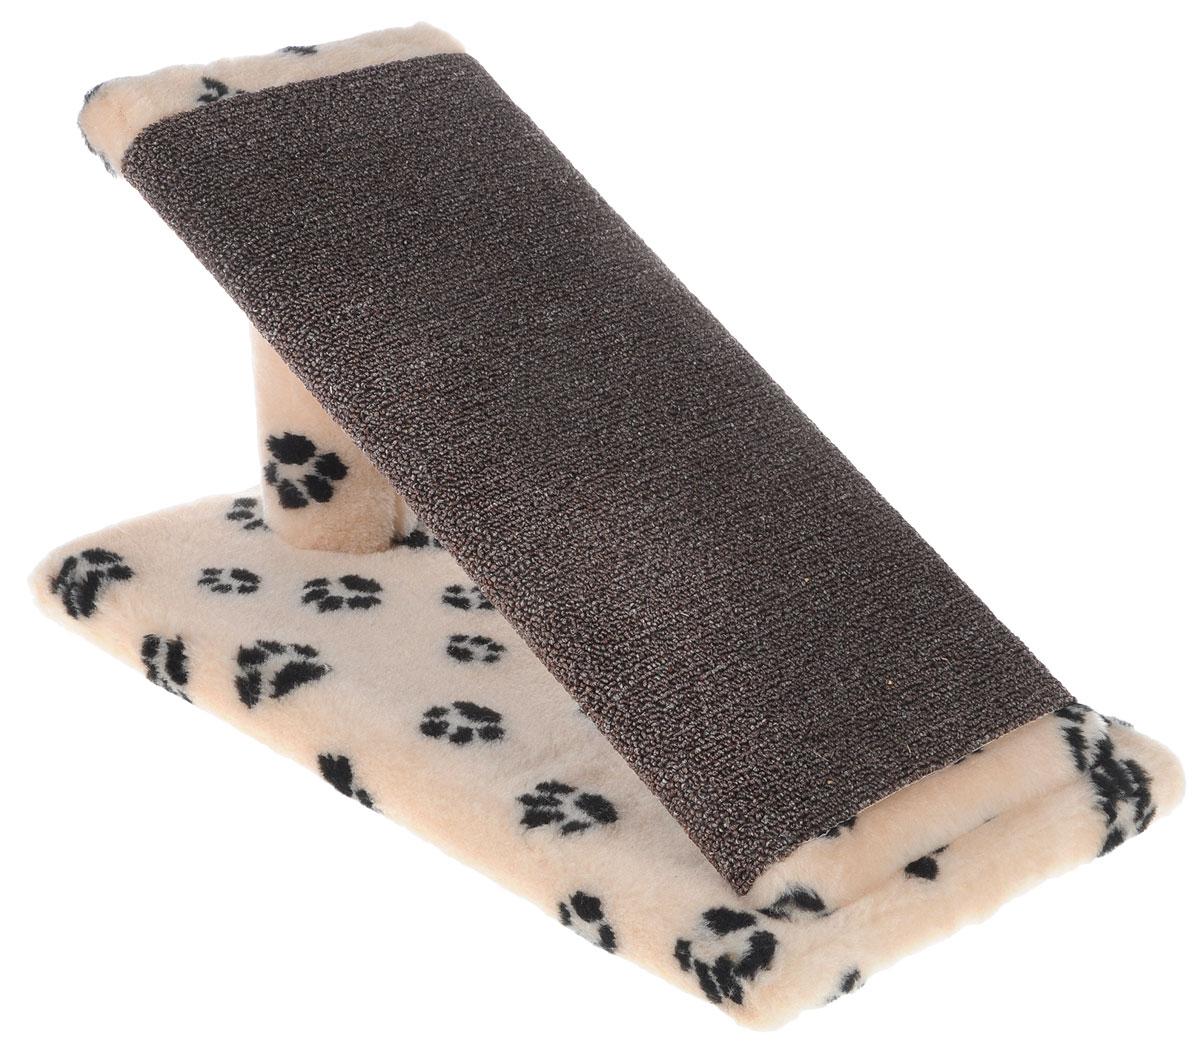 Когтеточка для котят Меридиан Горка, цвет: бежевый, черный, 45 х 25 х 25 см